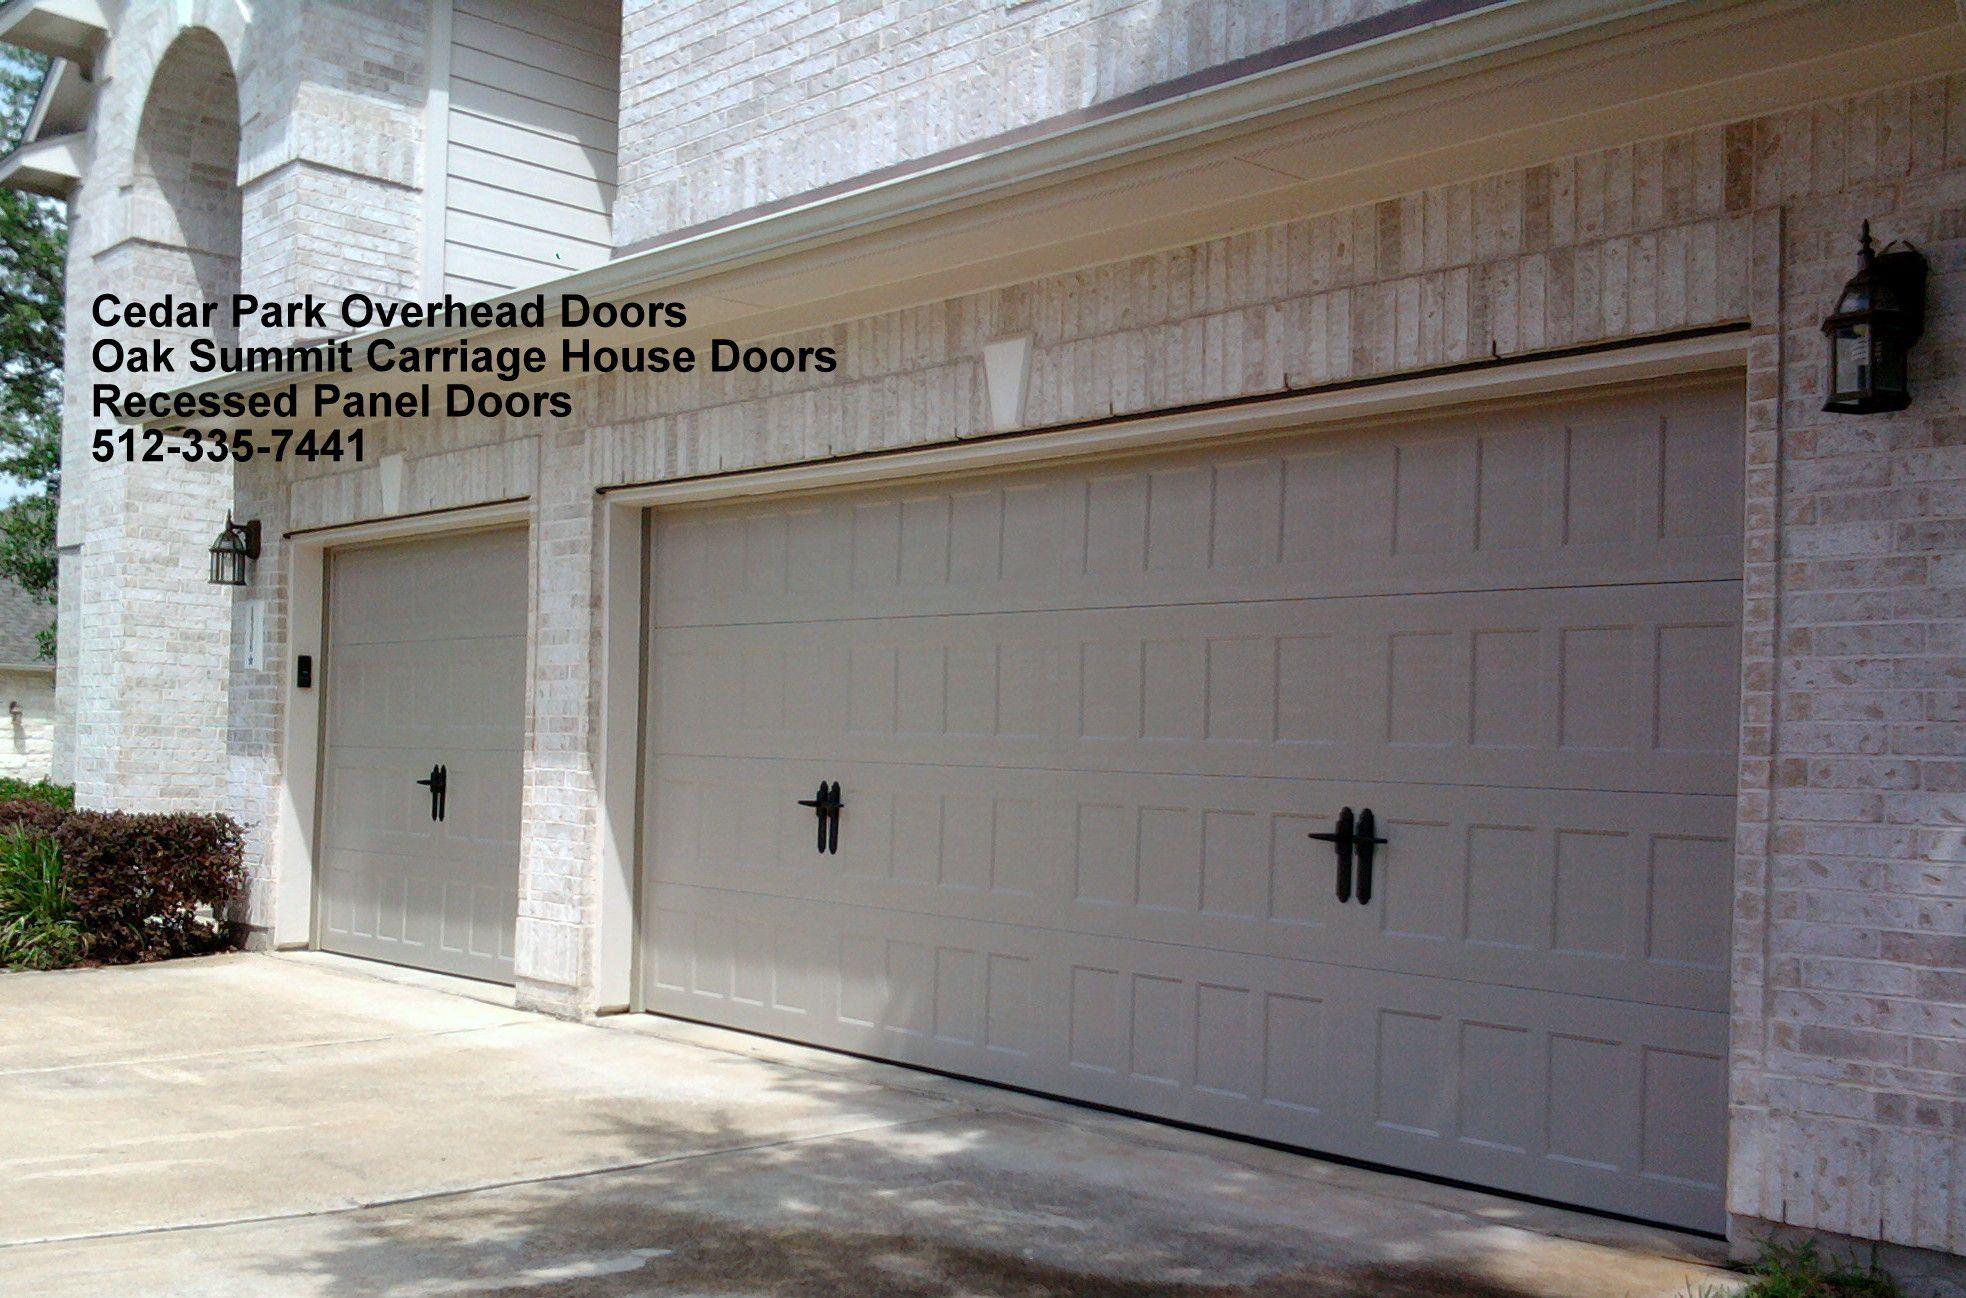 Exterior Garage Doors In White Vawter Dr Our Allen Edwin Home